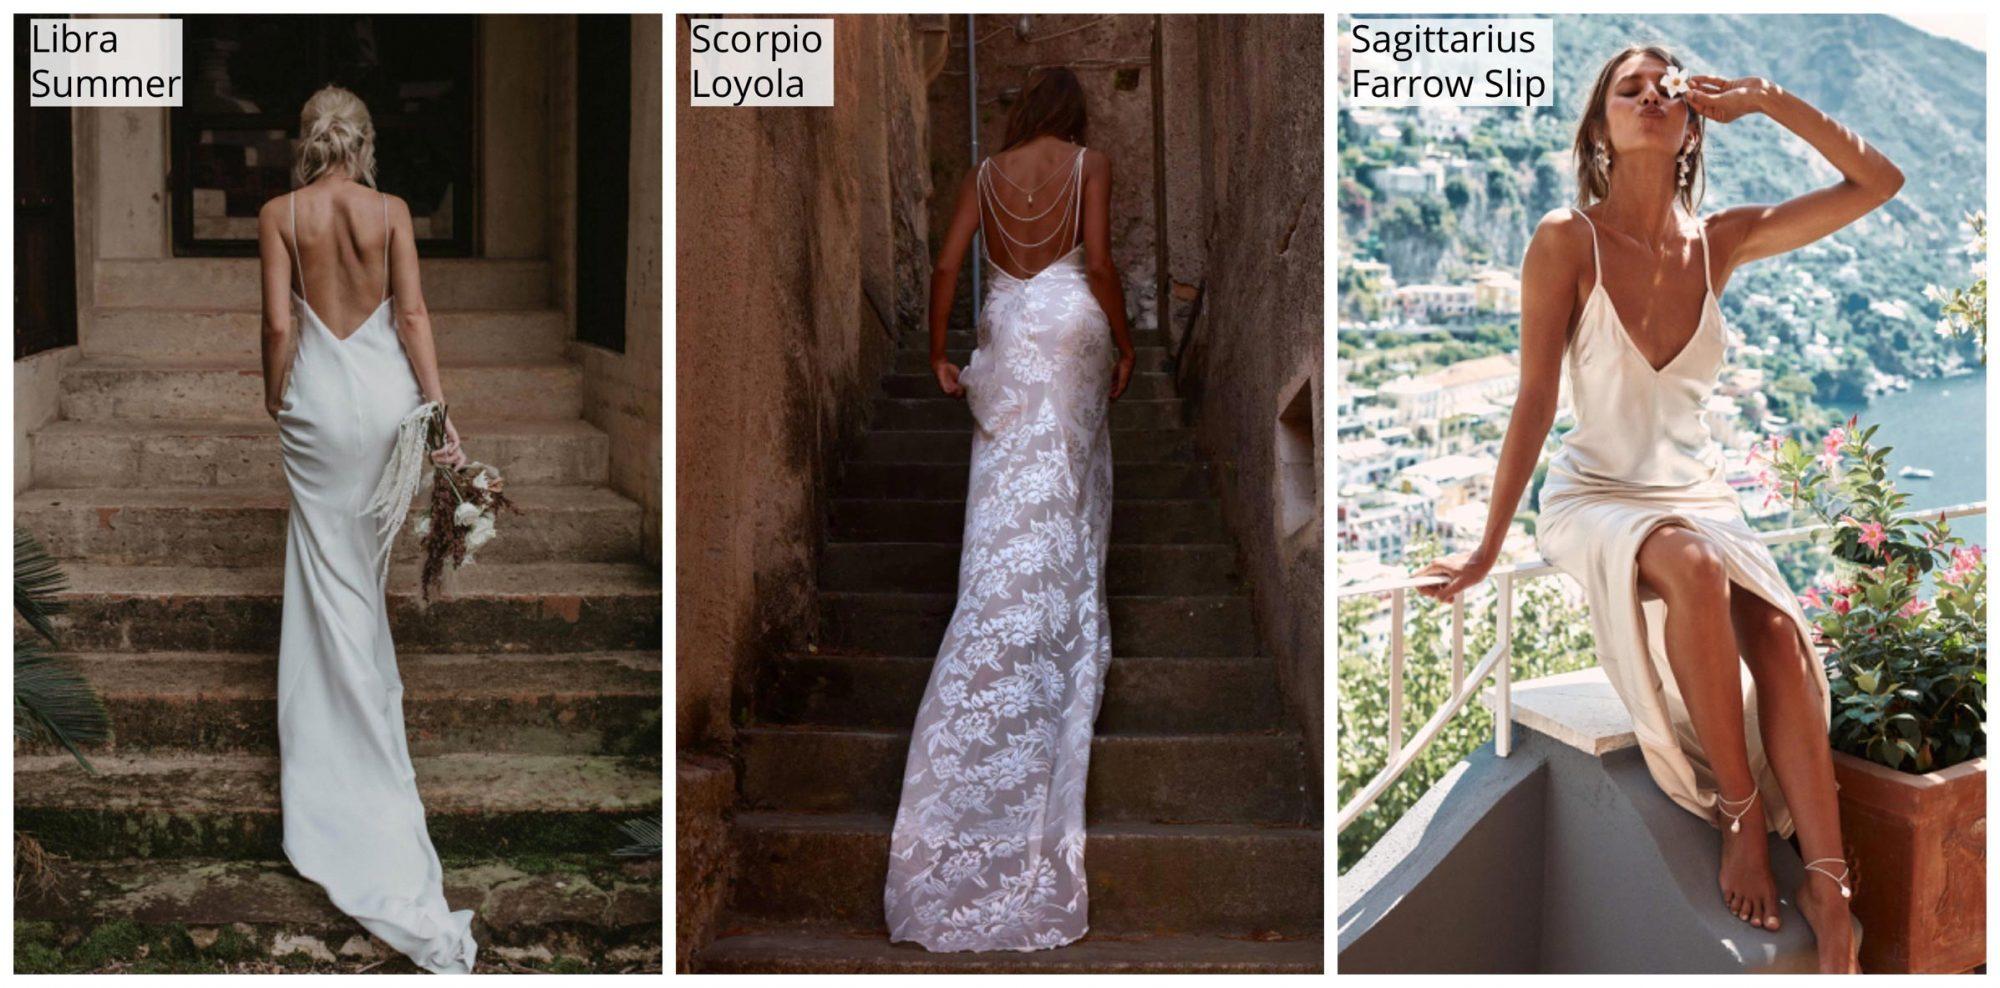 Dress for your zodiac: Libra Scorpio Sagittarius